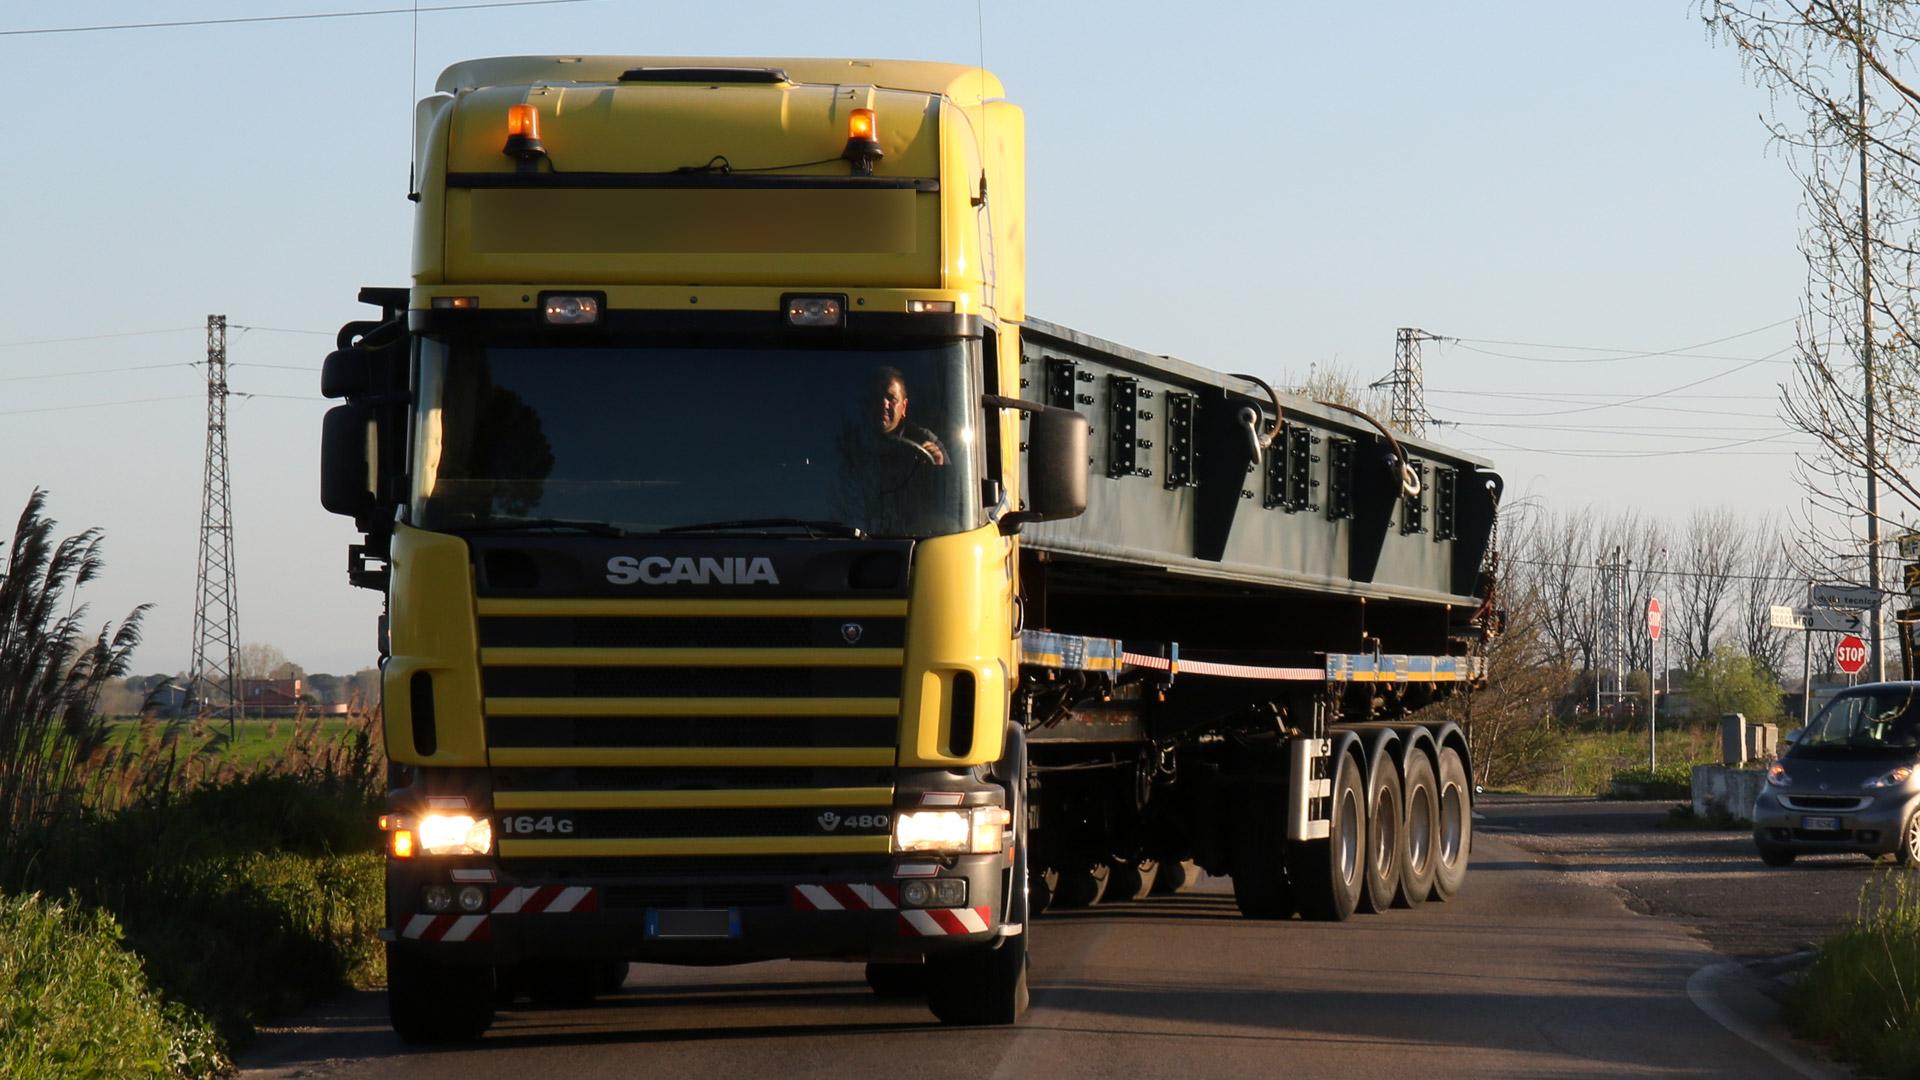 ponte-ferroviario-fiume-cavata-metal-engineering-carpenteria-civile-trasporto